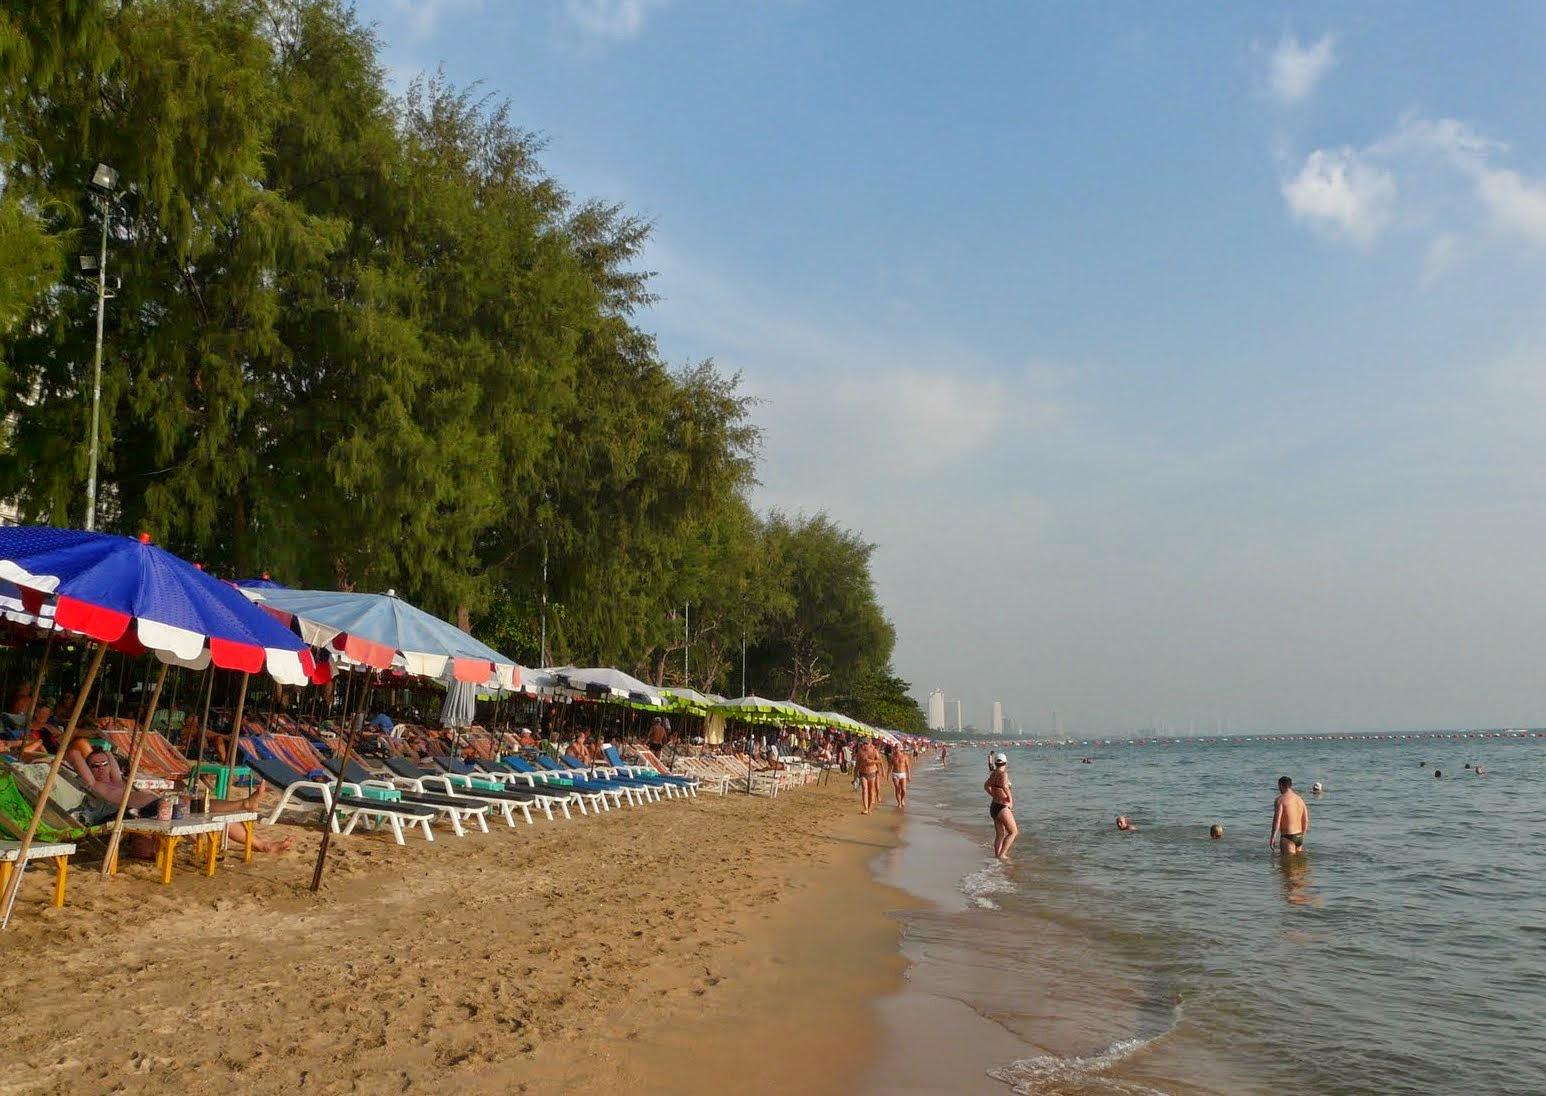 Jomtien Beach at its best